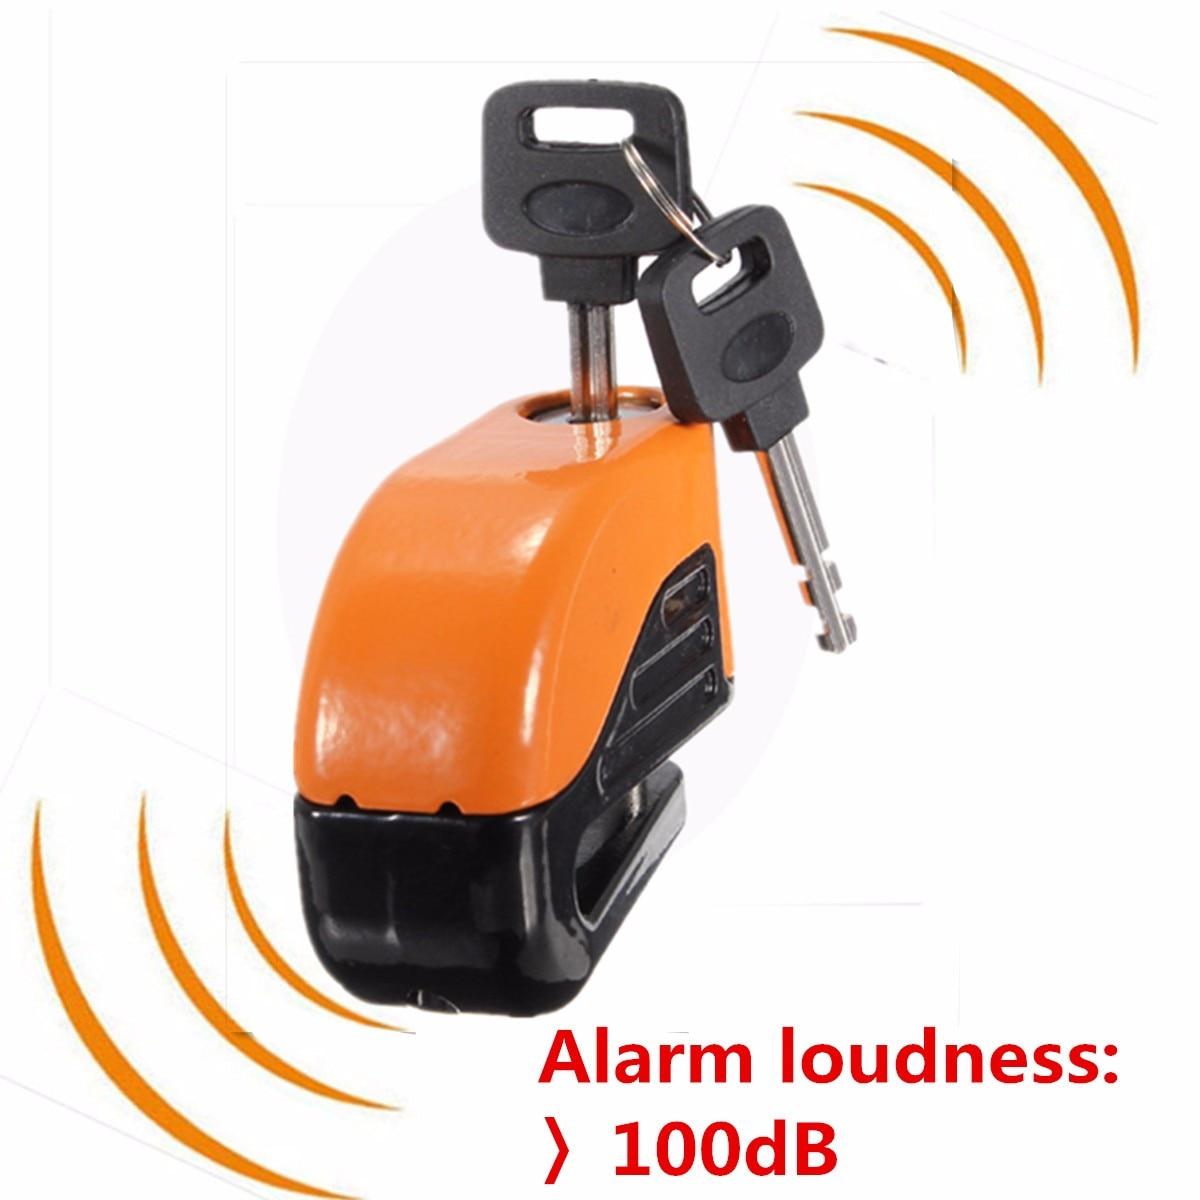 Orange 6mm Security Motorcycle Alarm Scooter Motorbike Lock Sturdy Wheel Disc Brake Lock Safety Alarm / key